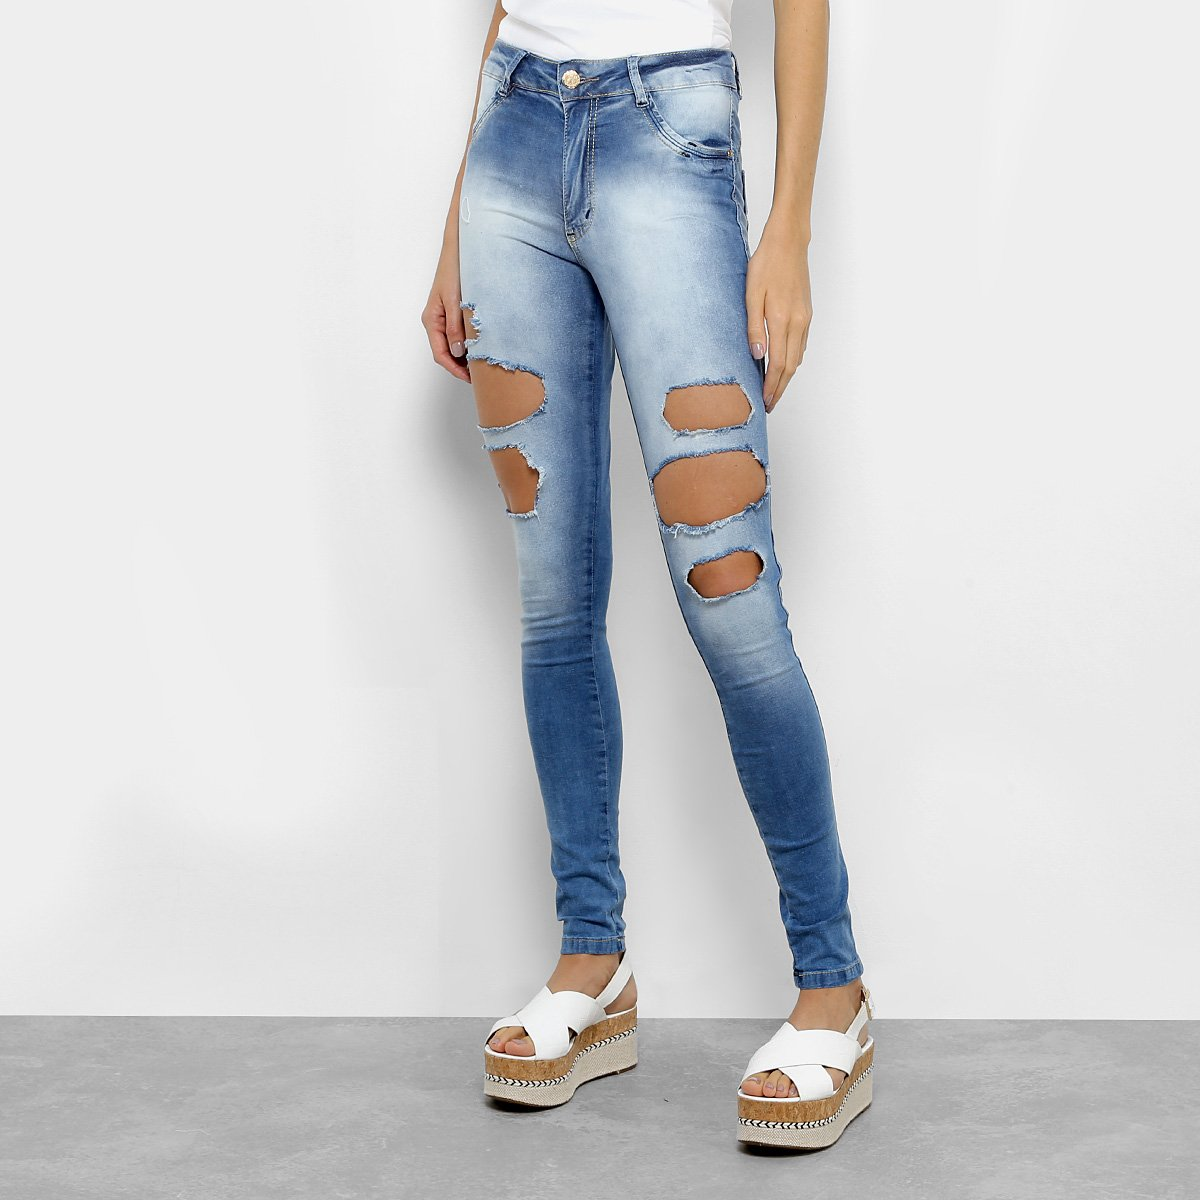 fc66216c0 Calça Jeans Cigarrete Biotipo Cintura Média Feminina